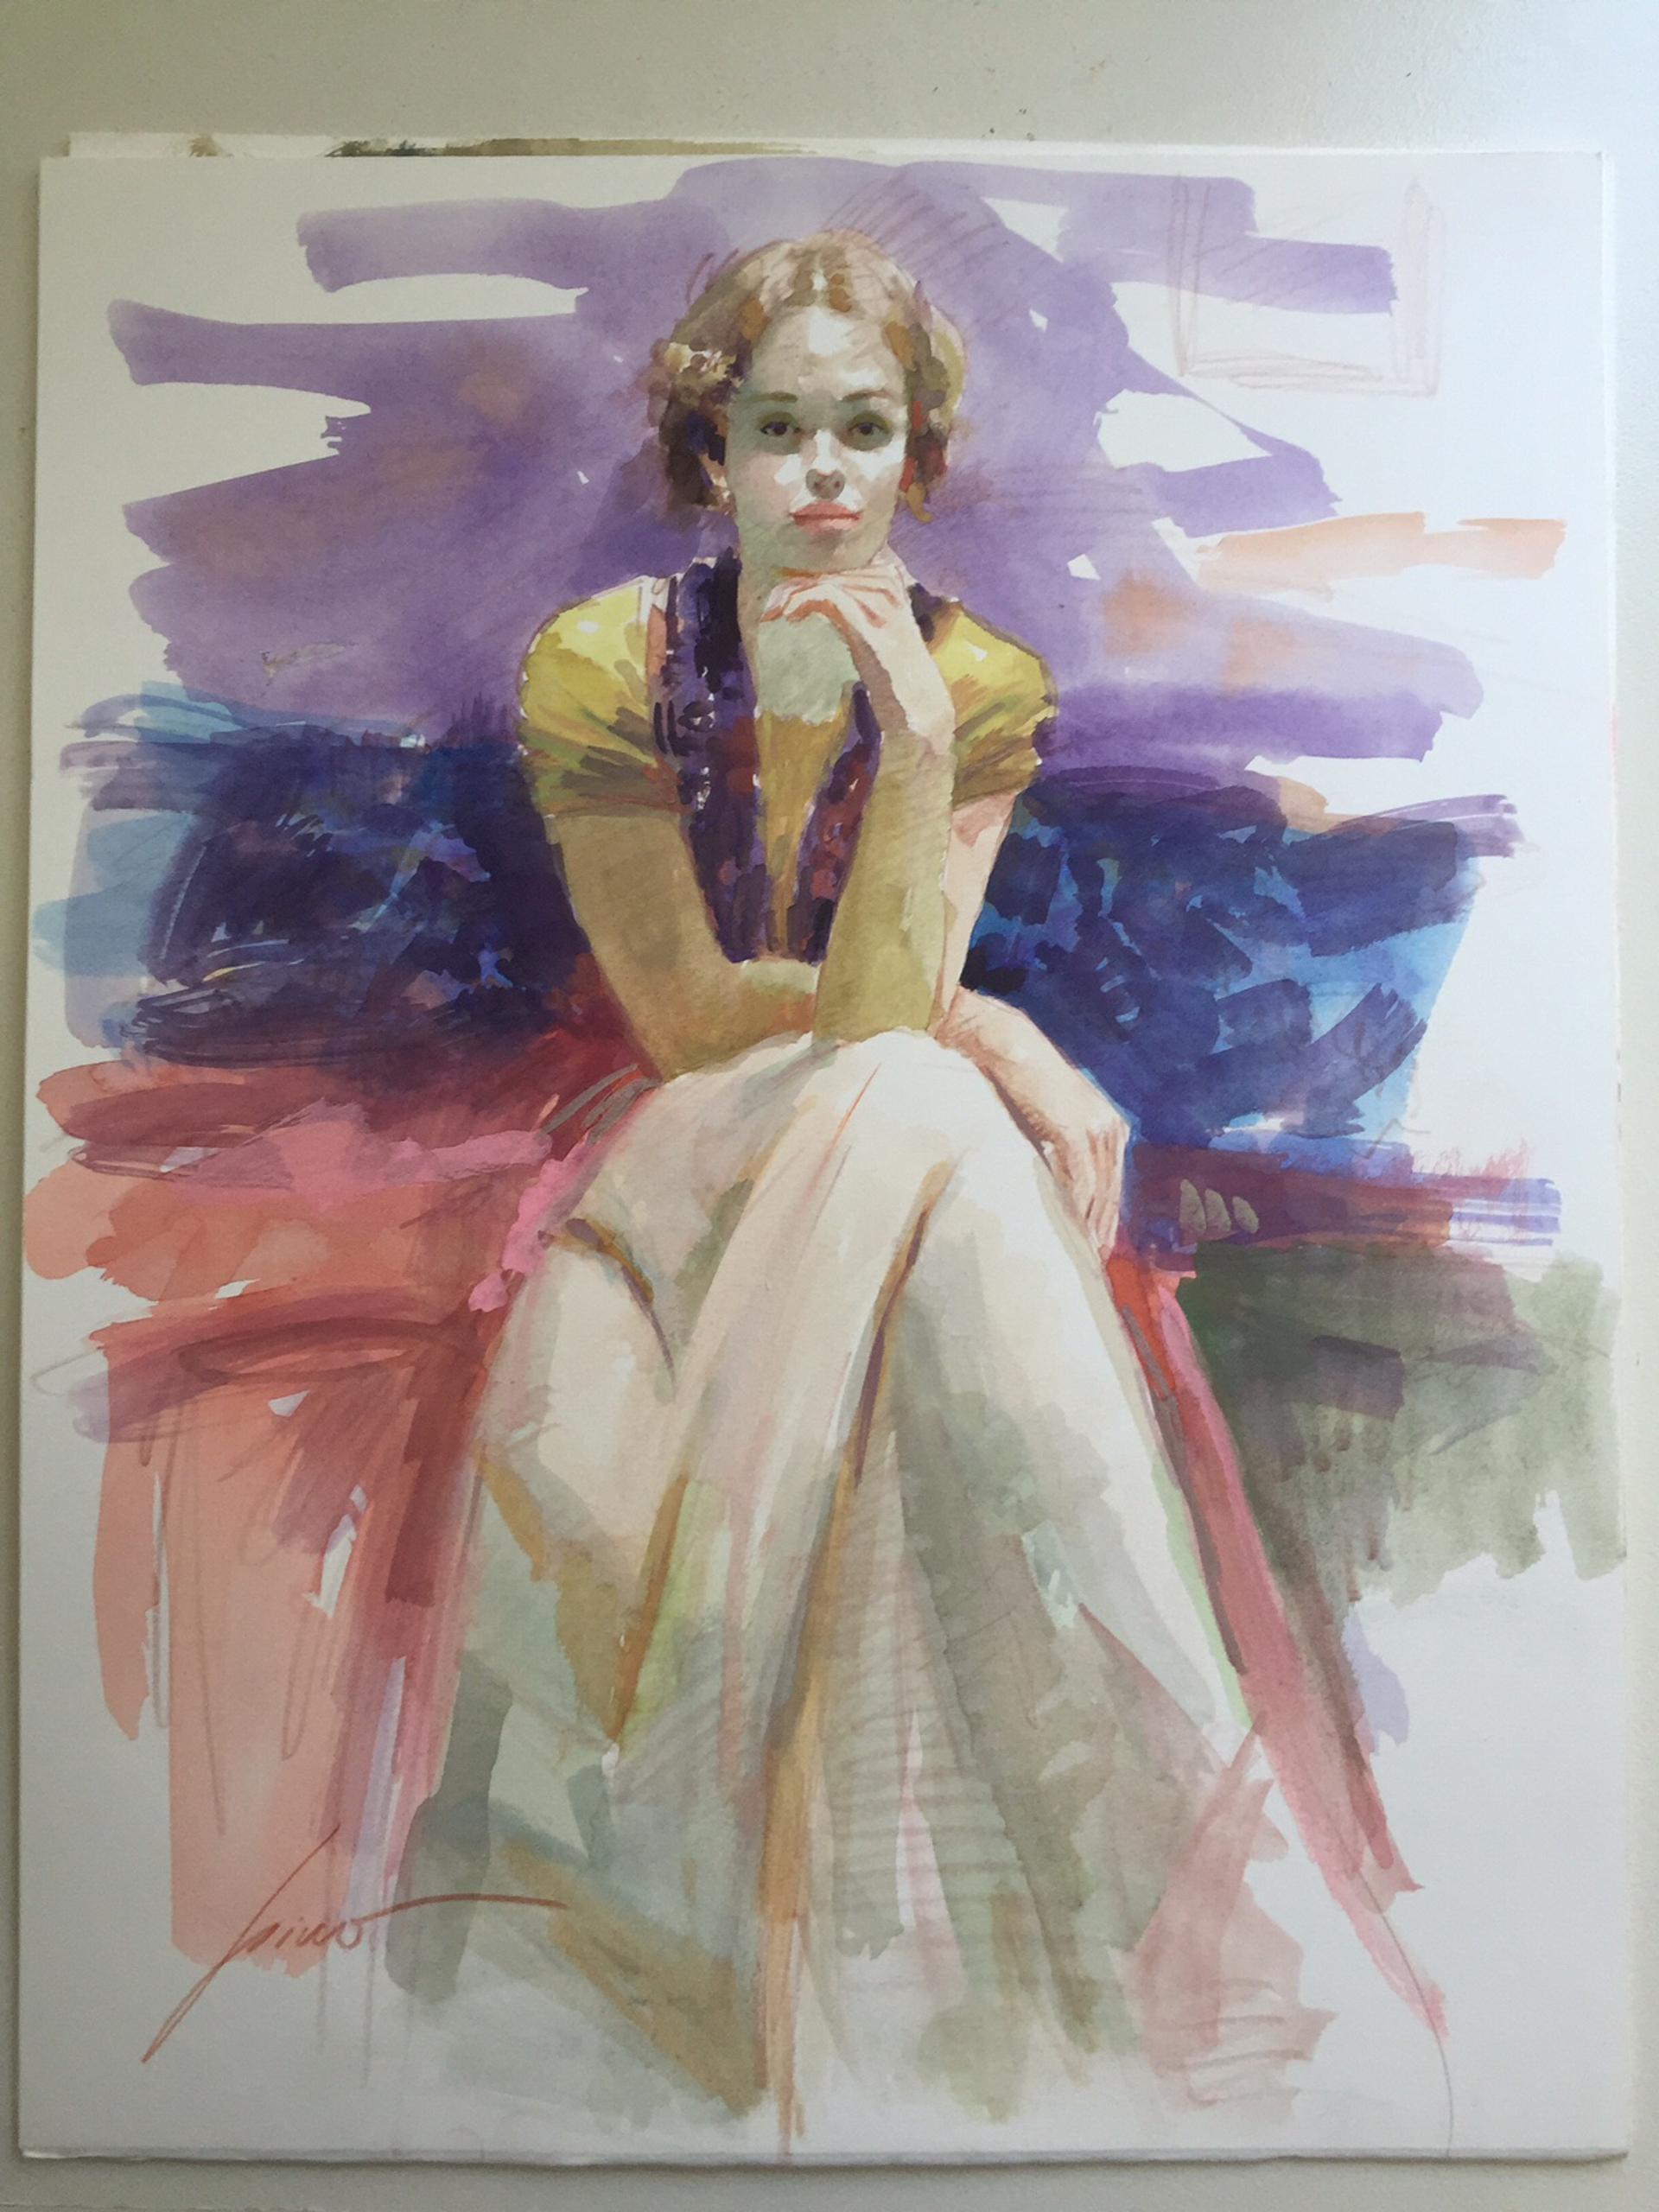 Original Watercolor Release 2 by Pino